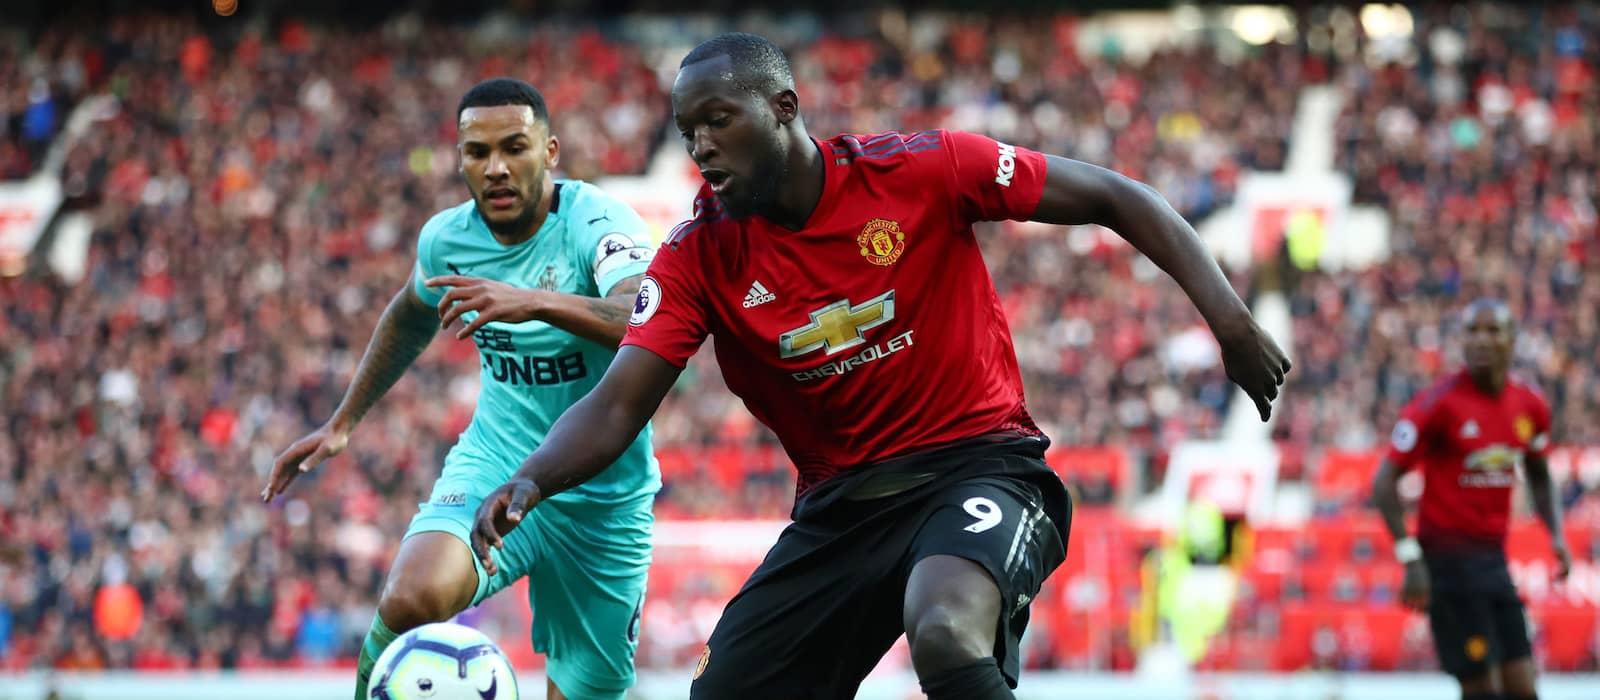 Romelu Lukaku: Jose Mourinho didn't say much after Newcastle win